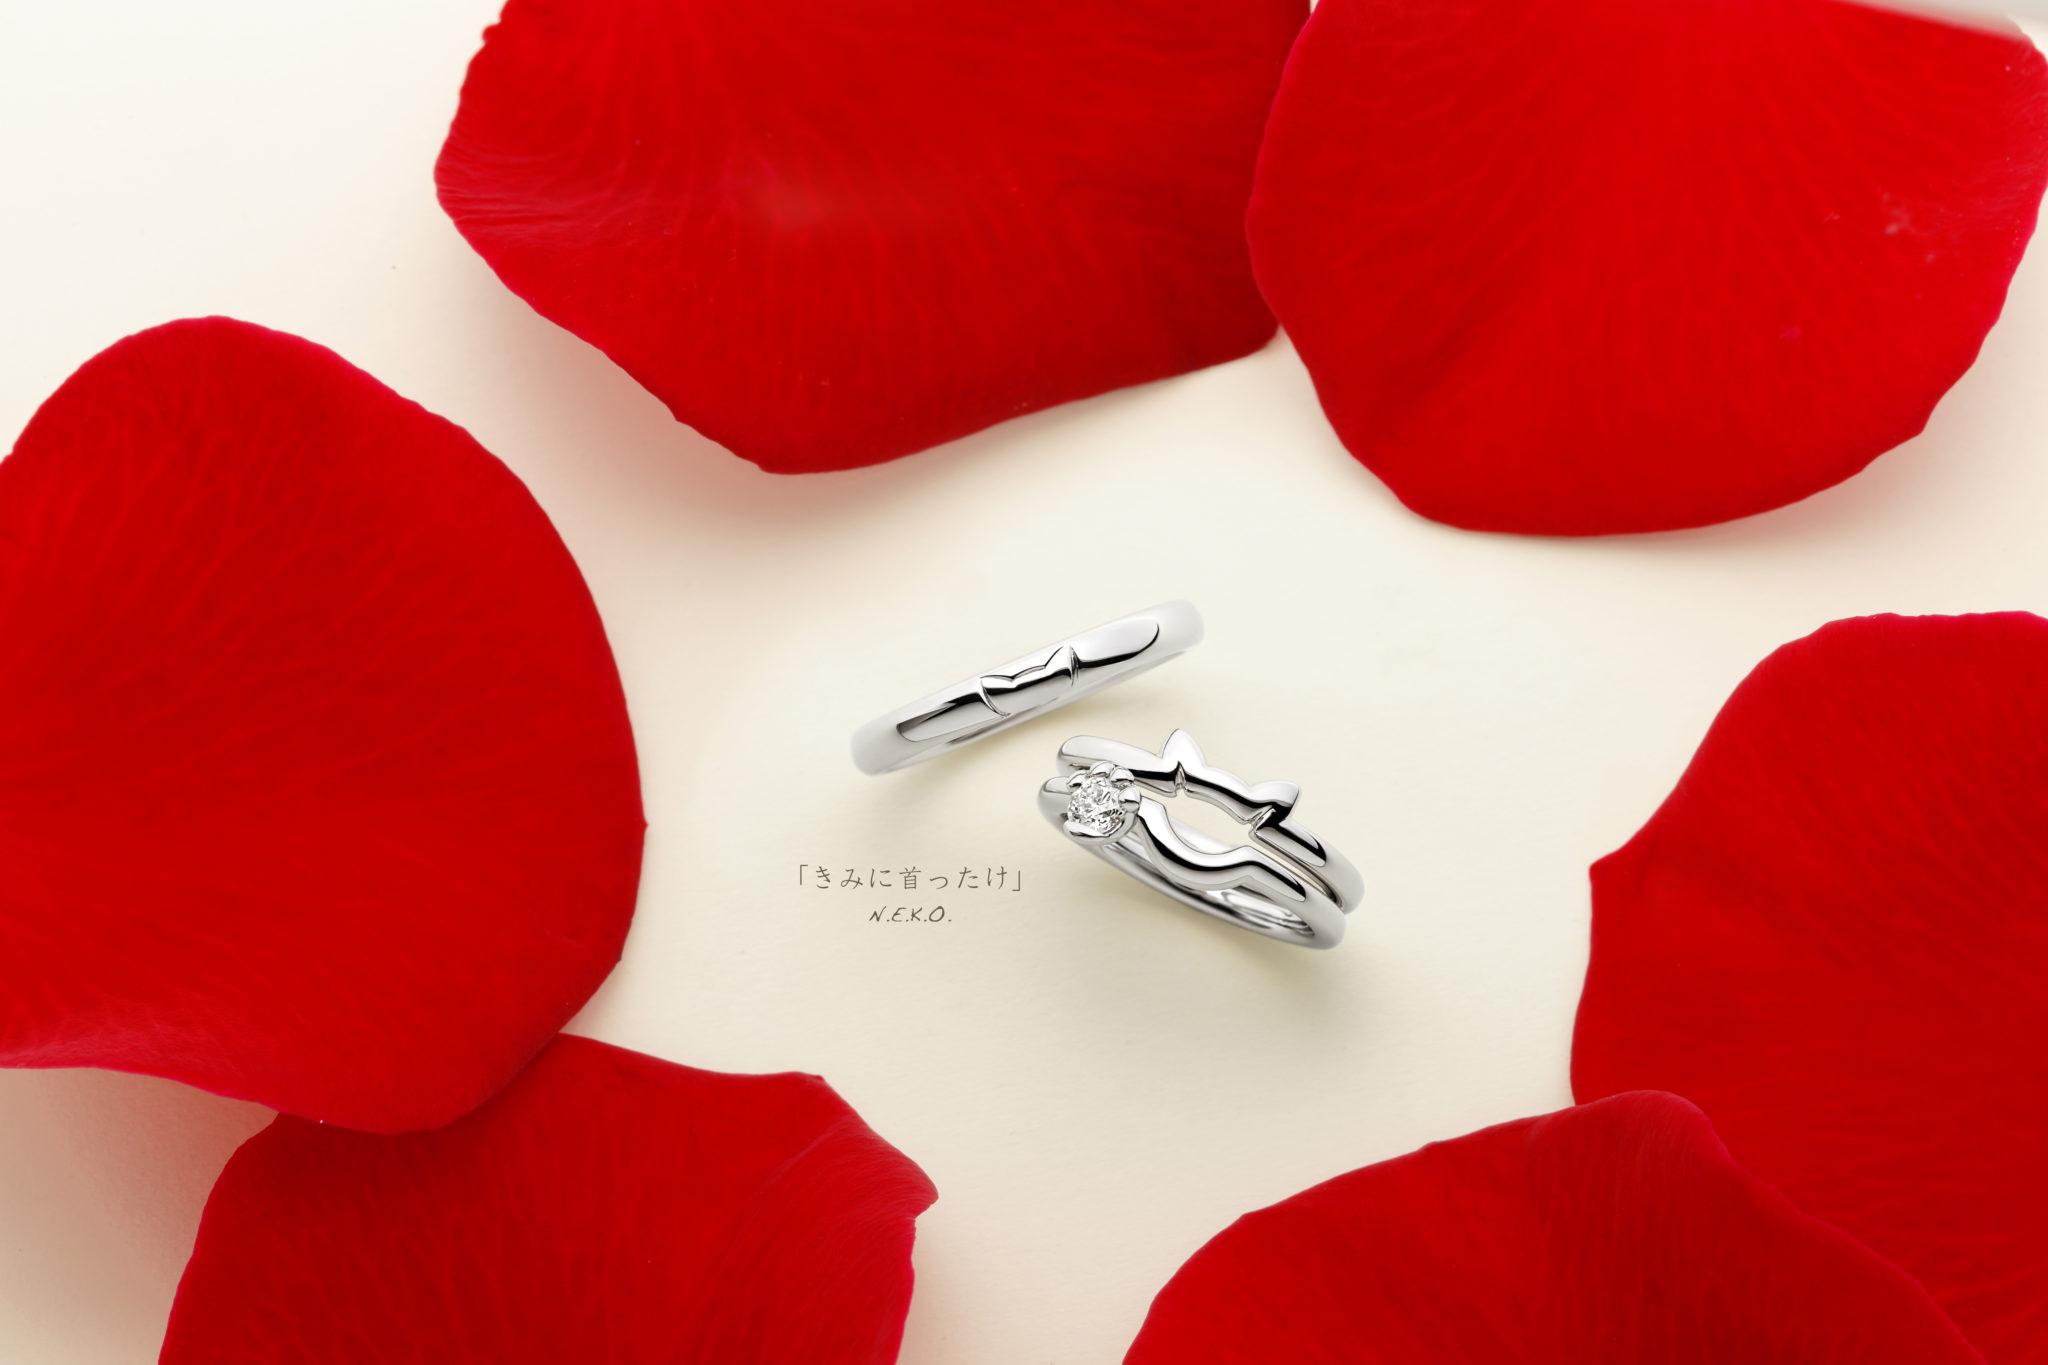 AFFLUX N.E.K.O|マリッジリング(結婚指輪)・ エンゲージリング(婚約指輪)